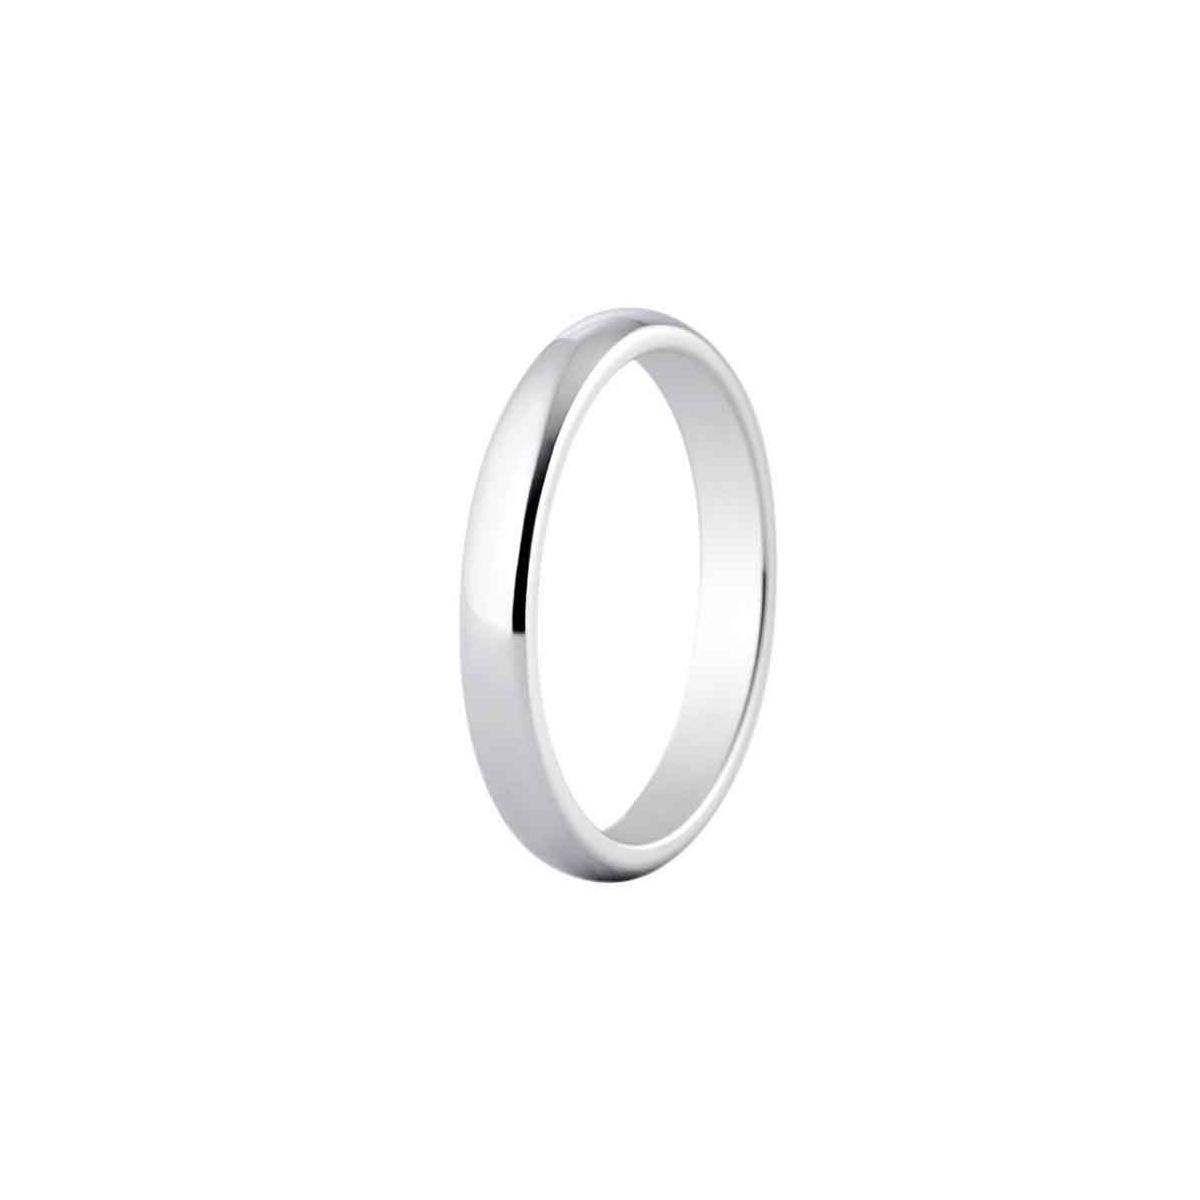 Alianza de boda 3 mm de ancho en platino